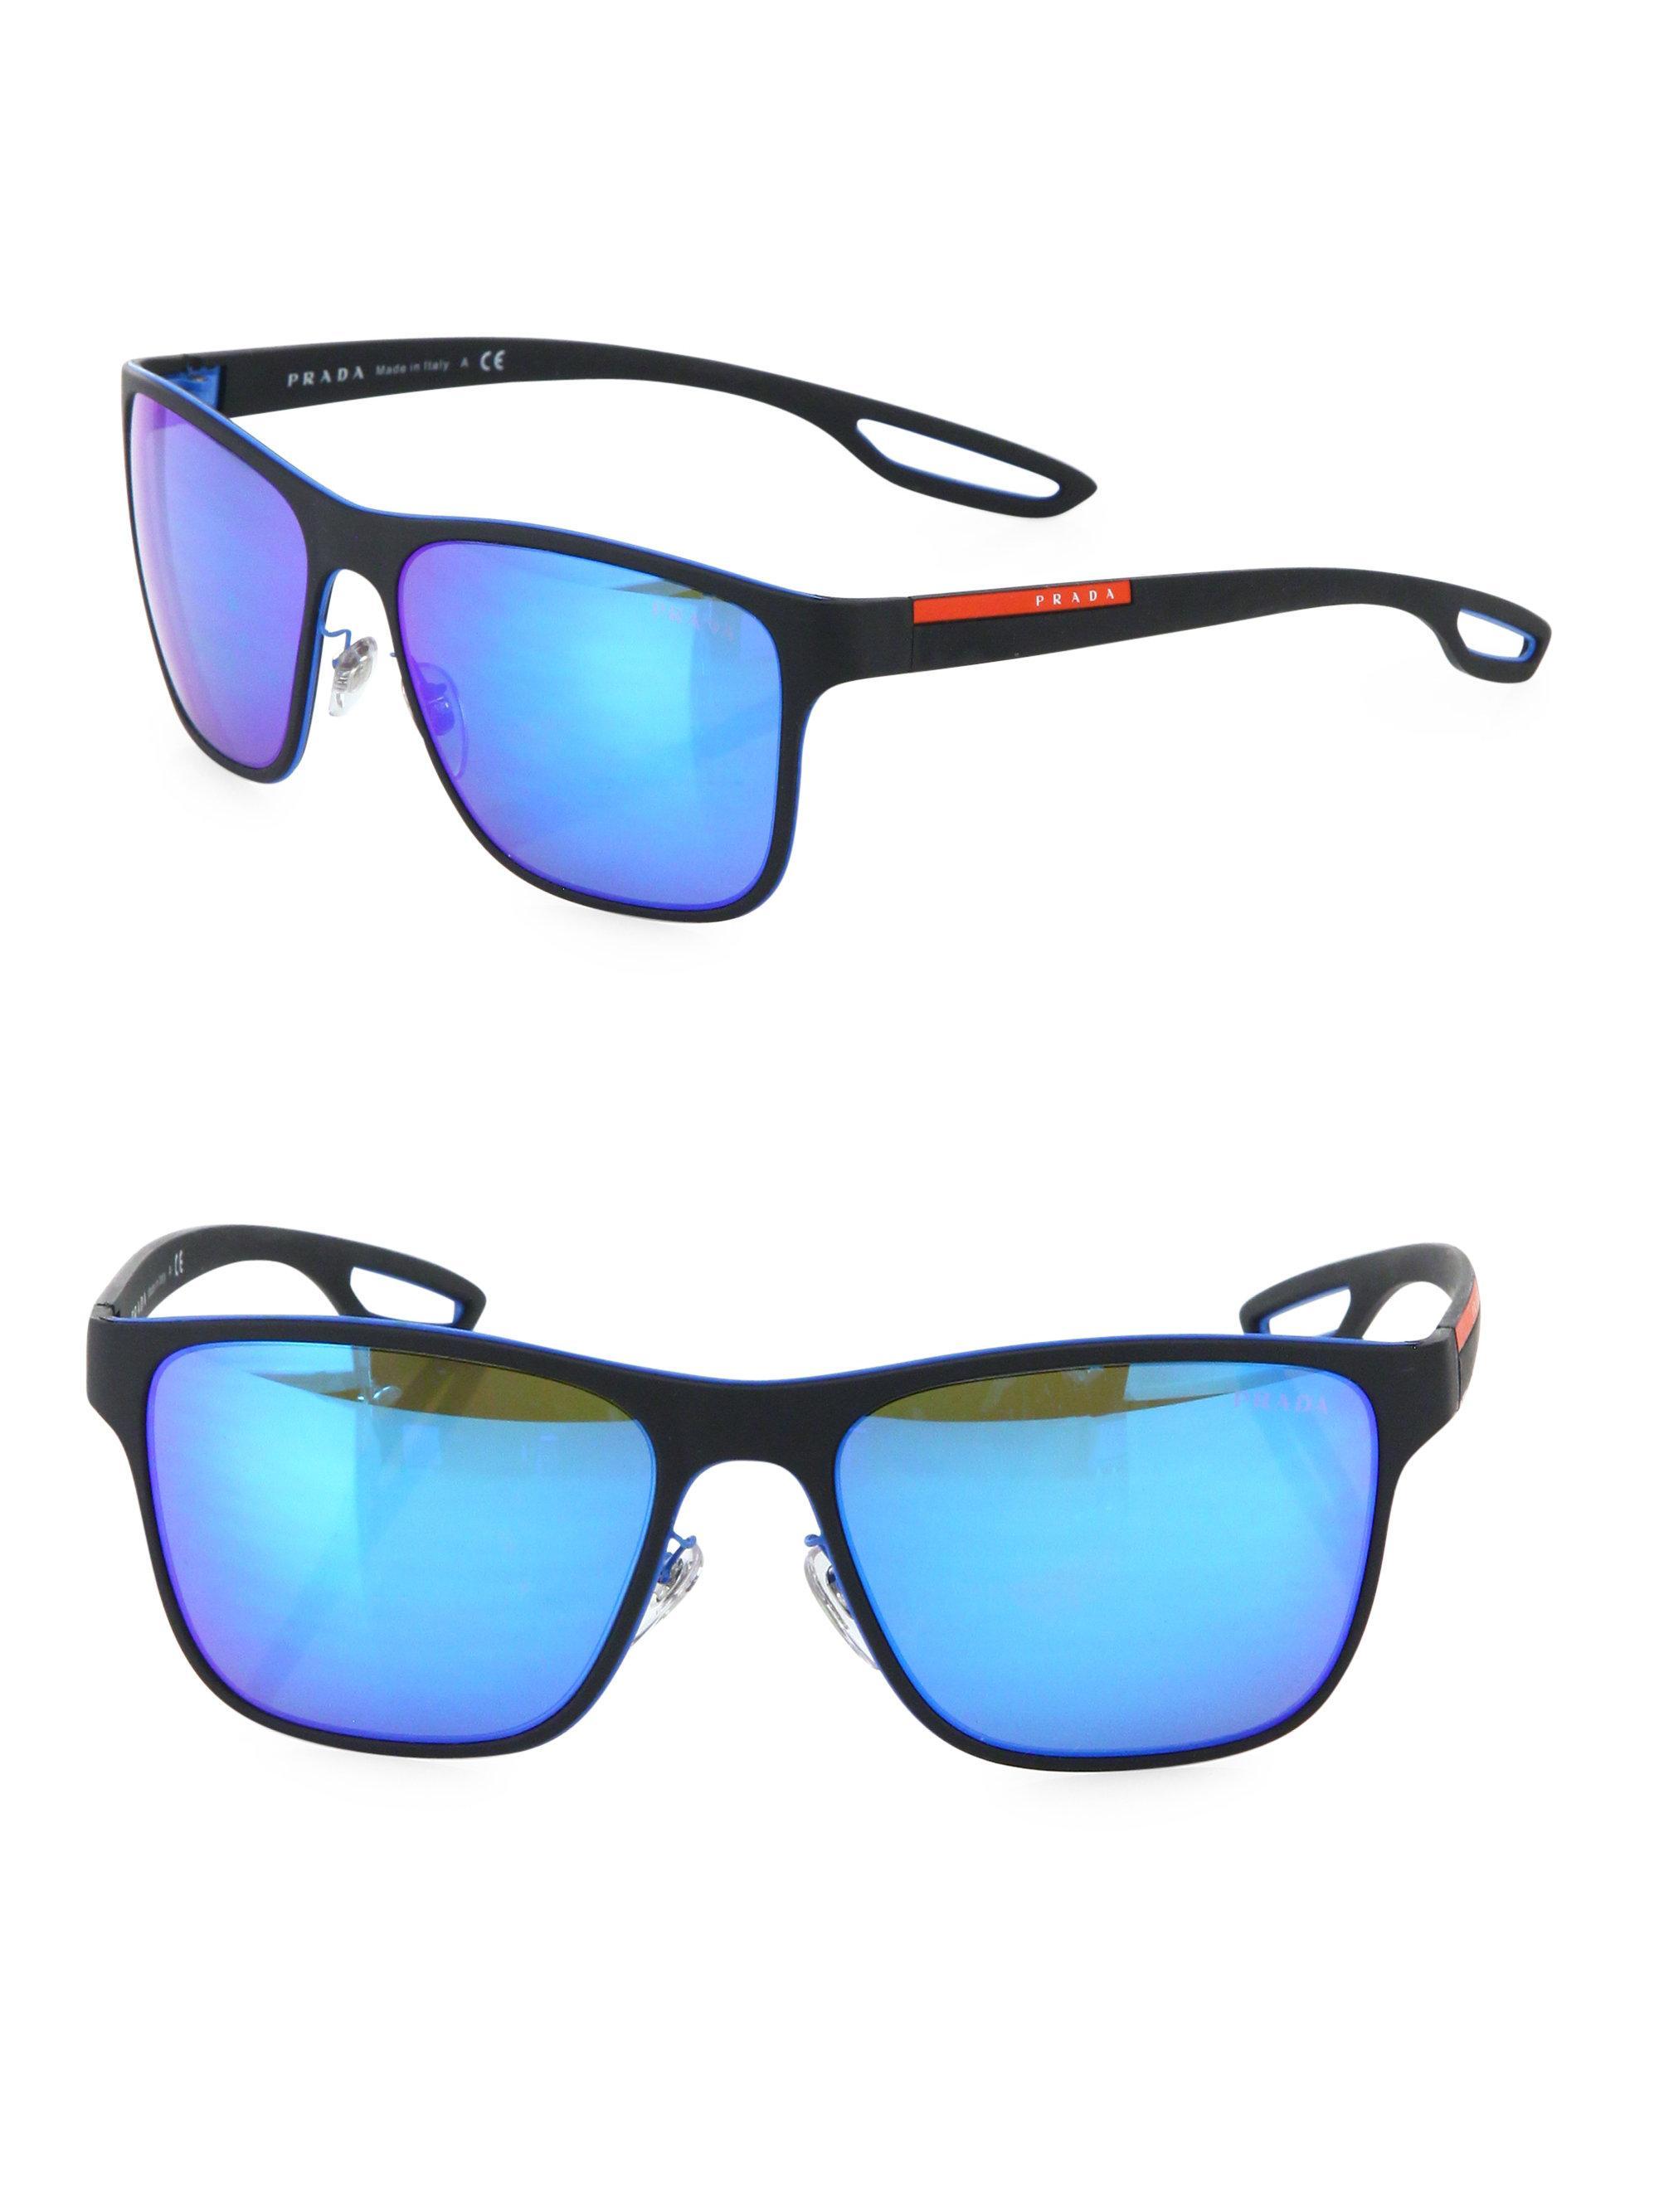 7421b596f095 best lyst prada 56mm injected square sunglasses in blue for men f9b49 1fc49